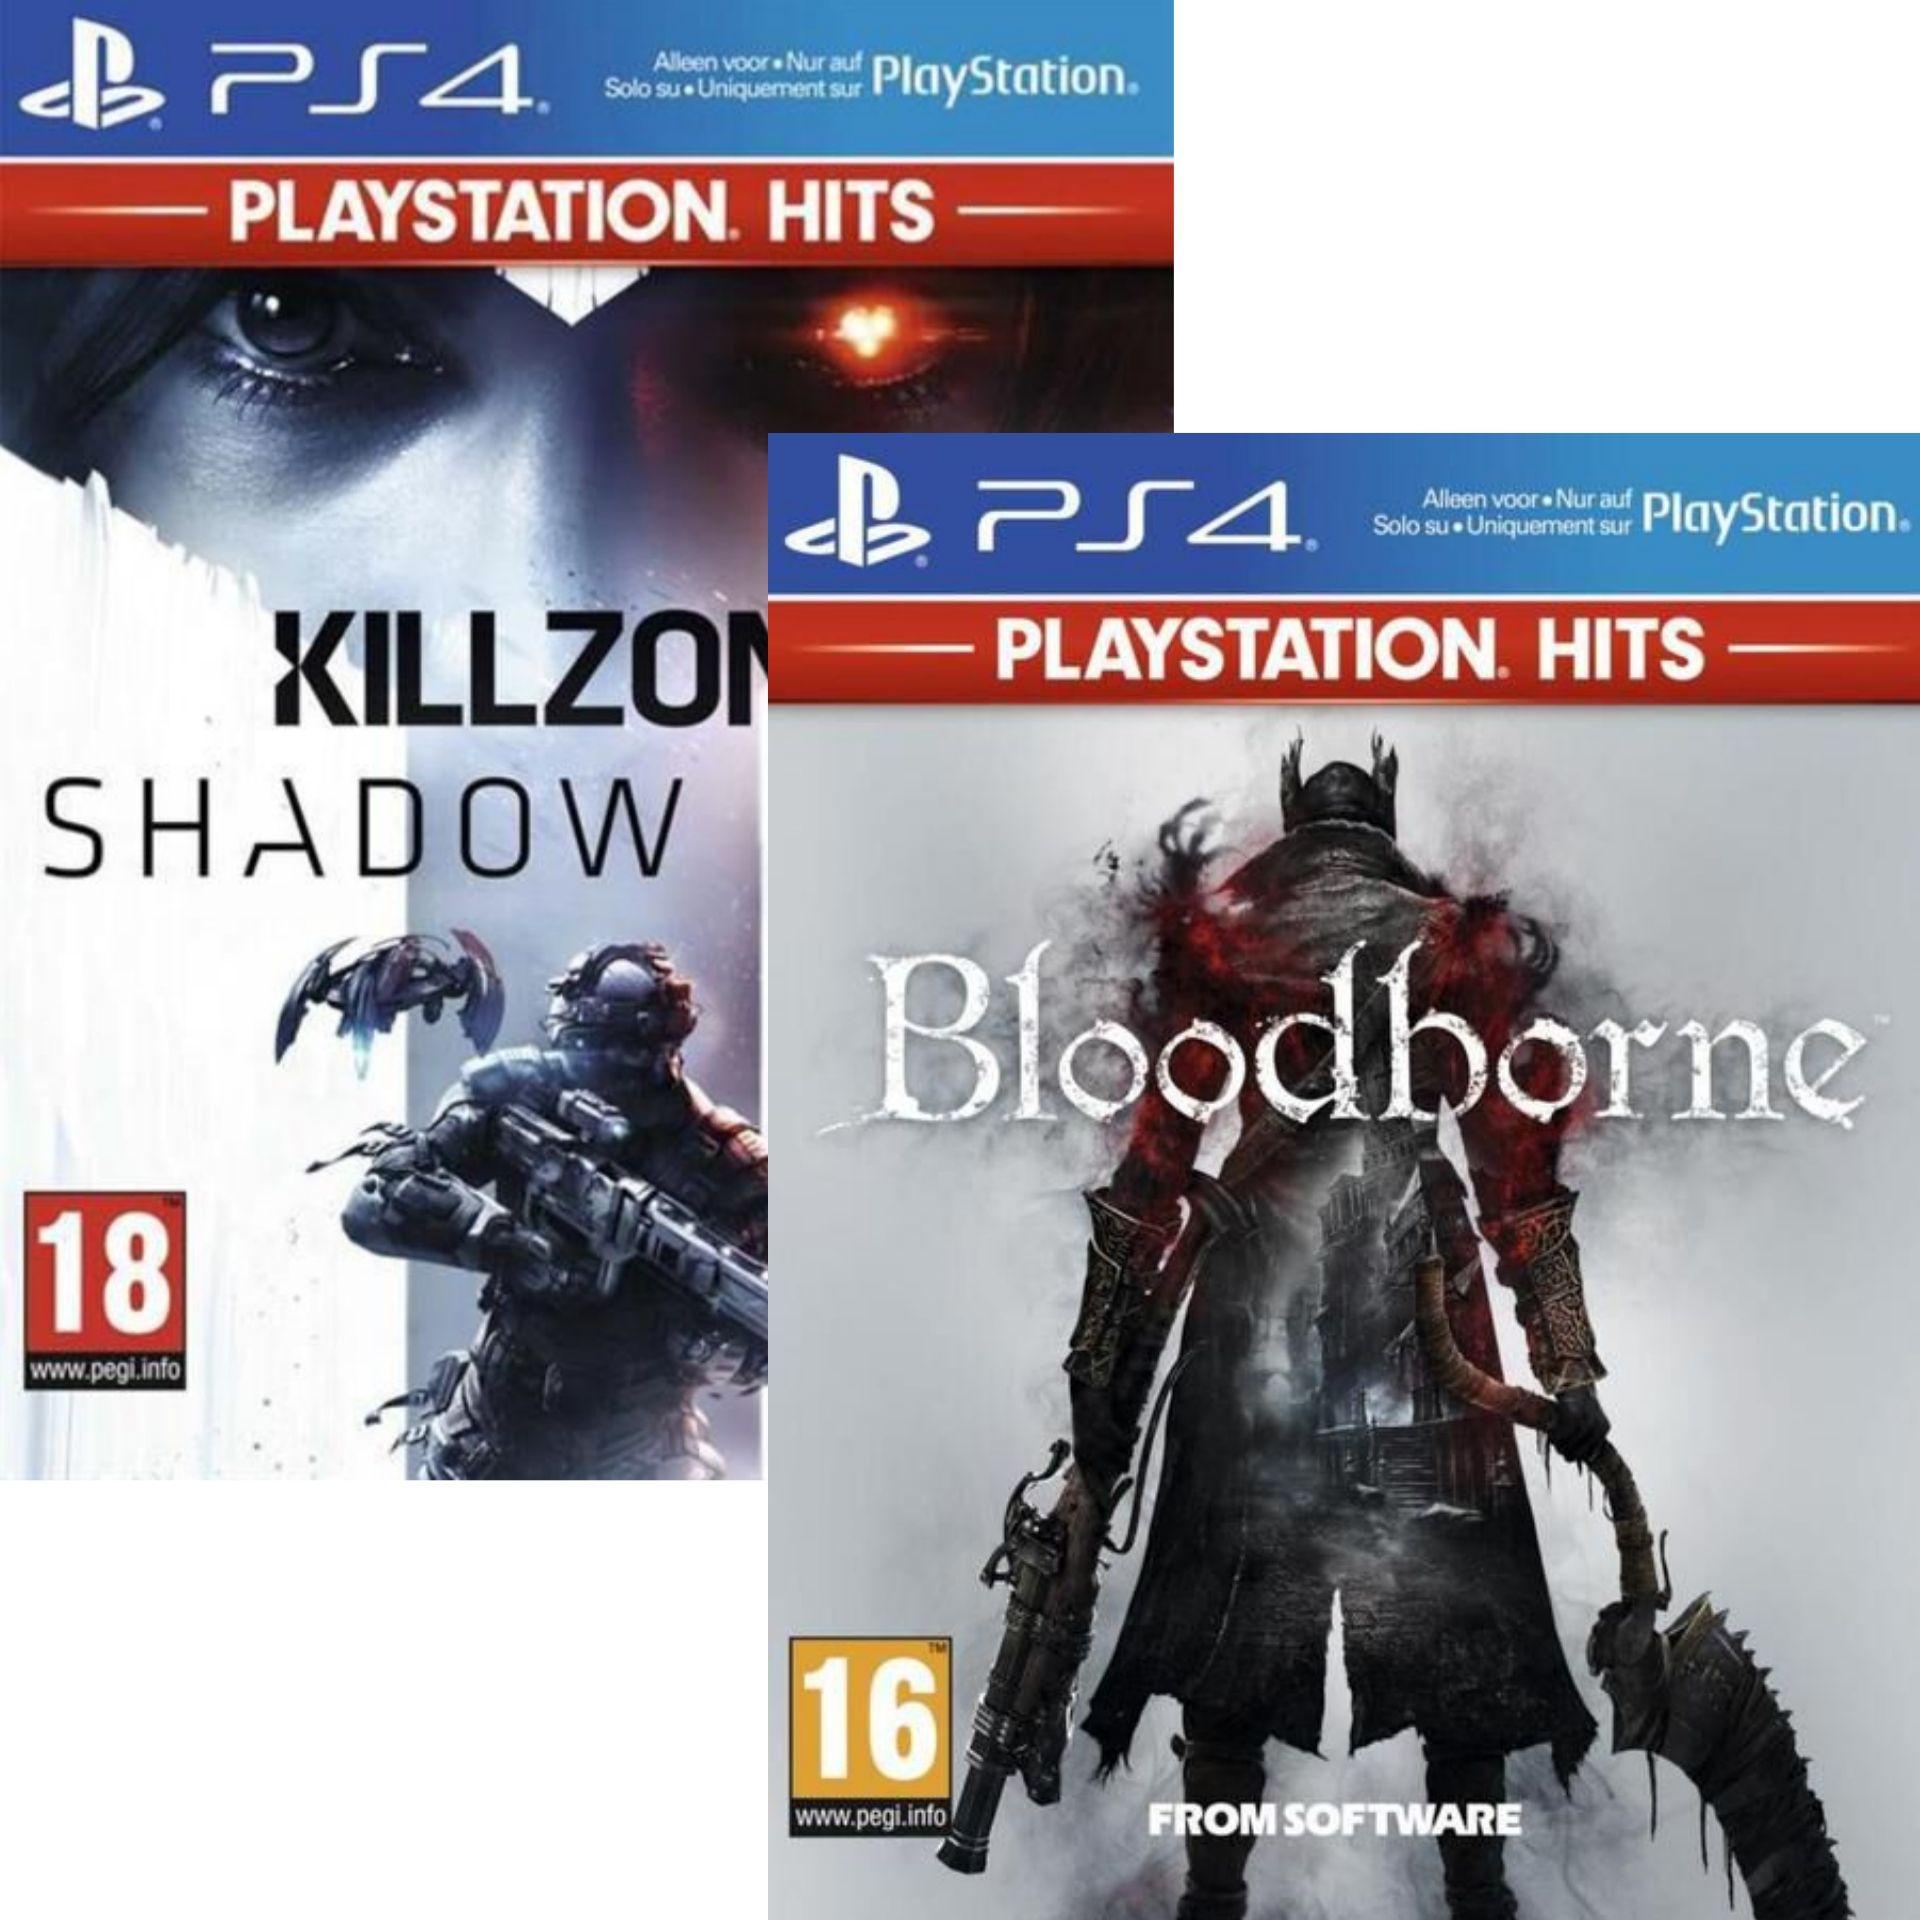 Killzone Shadow Fall ou Bloodborne - PlayStation Hits sur PS4 (Via retrait magasin)